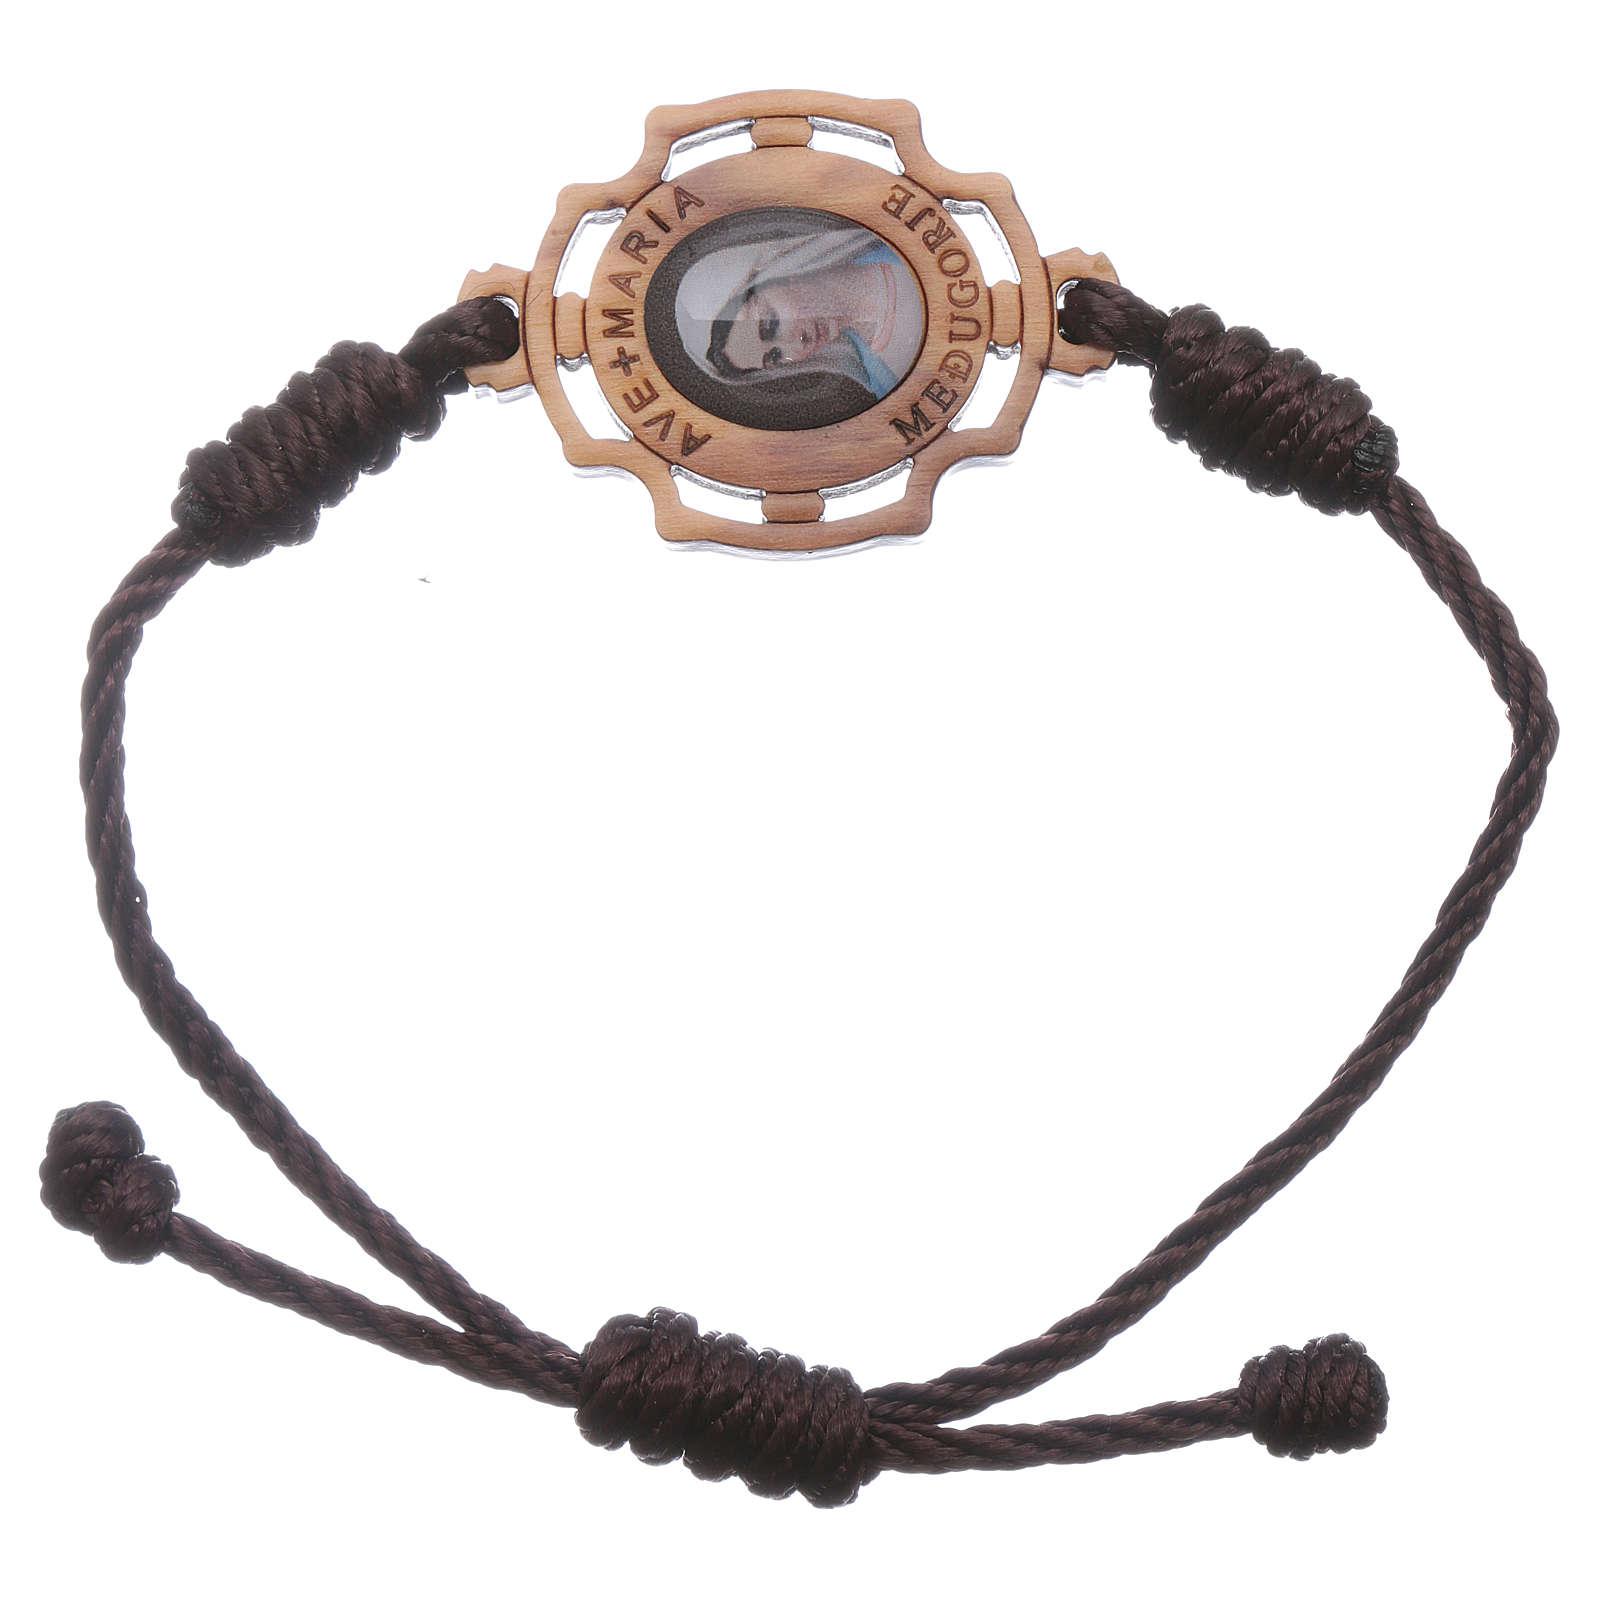 Bracelet Medjugorje corde image Gospa 4